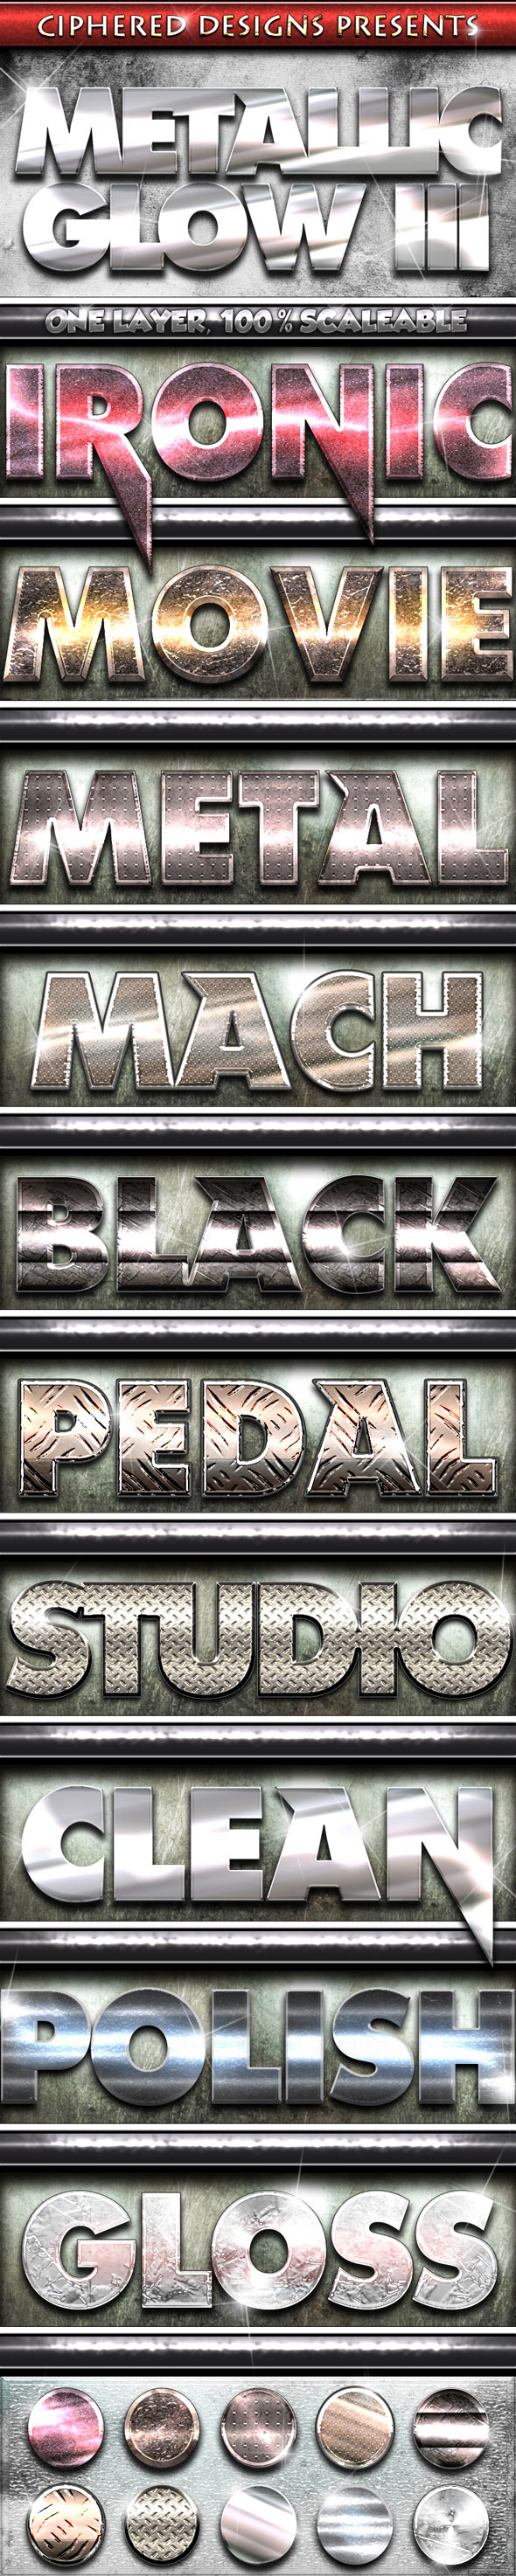 Metallic Glow III - Professional Styles - Text Effects Styles